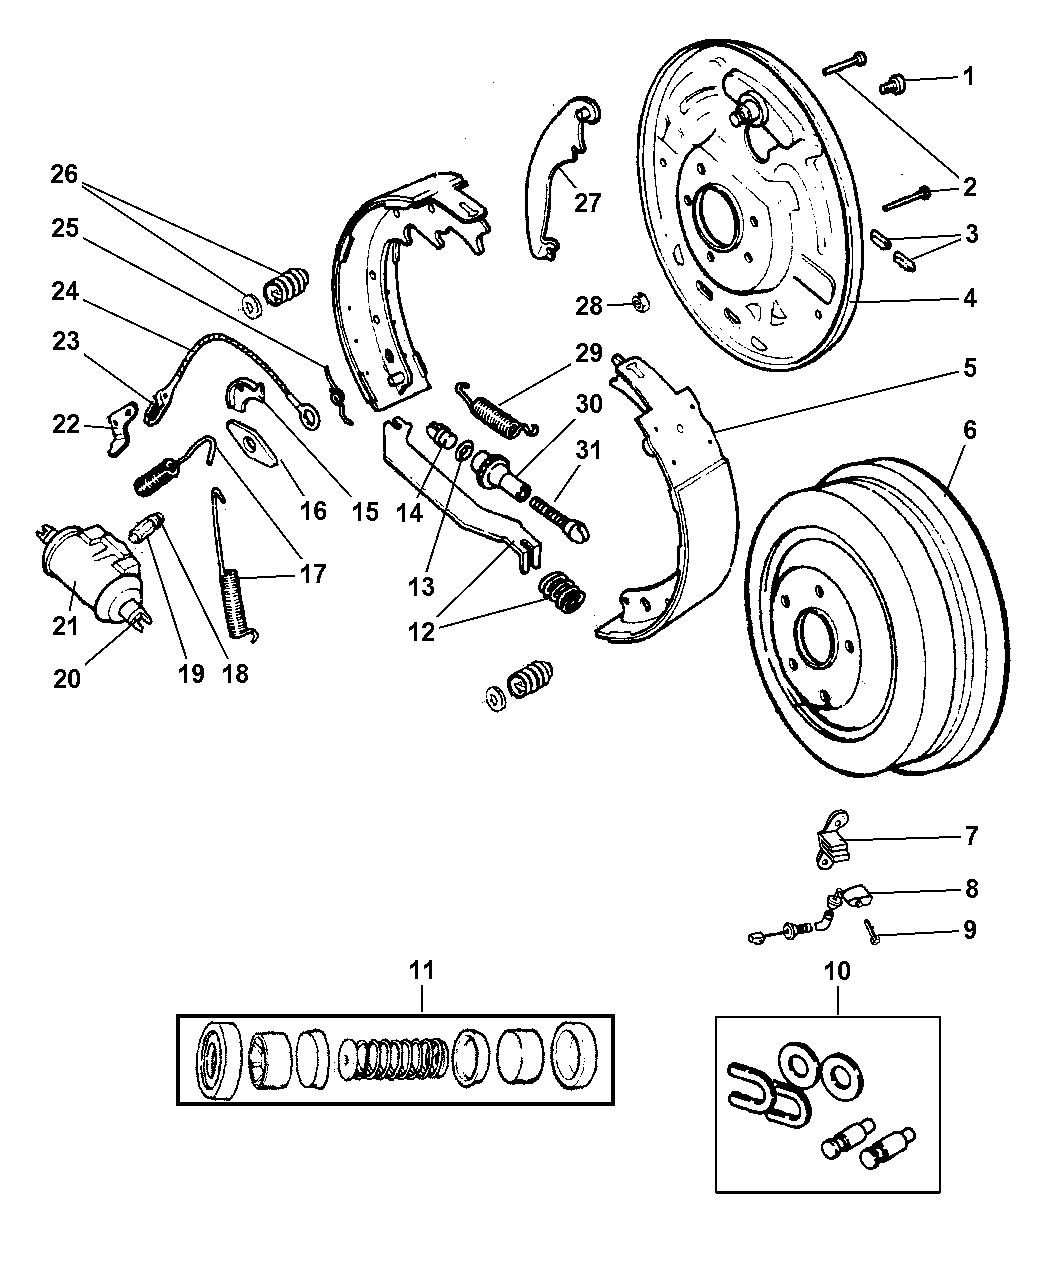 1997 jeep wrangler fuse diagram fuel injector 1997 jeep wrangler brake diagram 4723367ab - genuine jeep shoe kit-drum #9